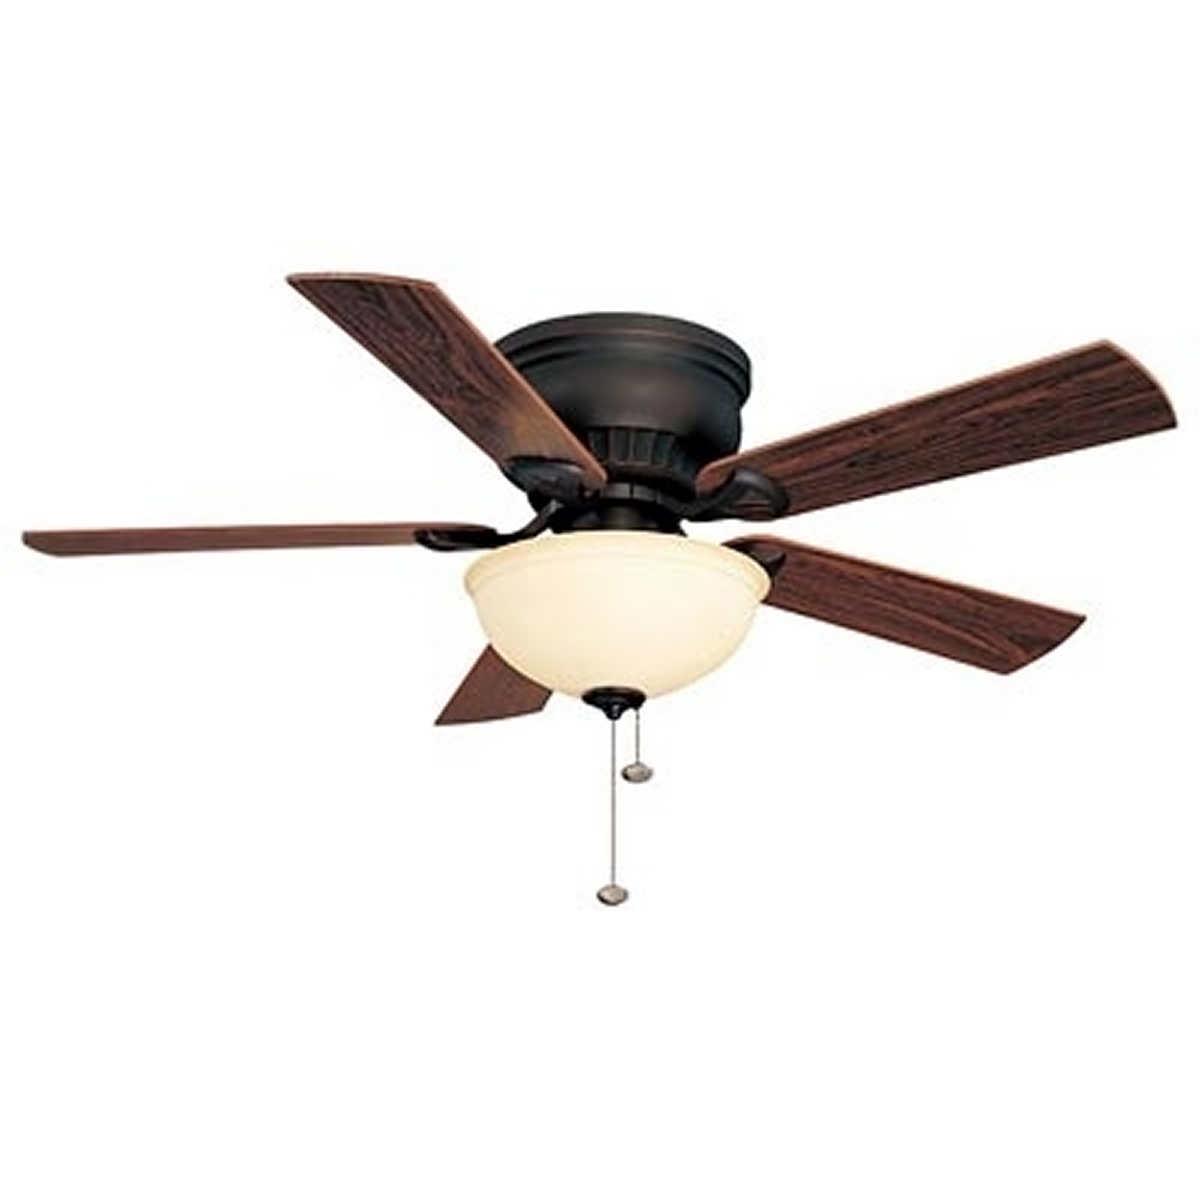 single blade ceiling fan singapore  lader blog - blade ceiling fan singapore winda  furniture